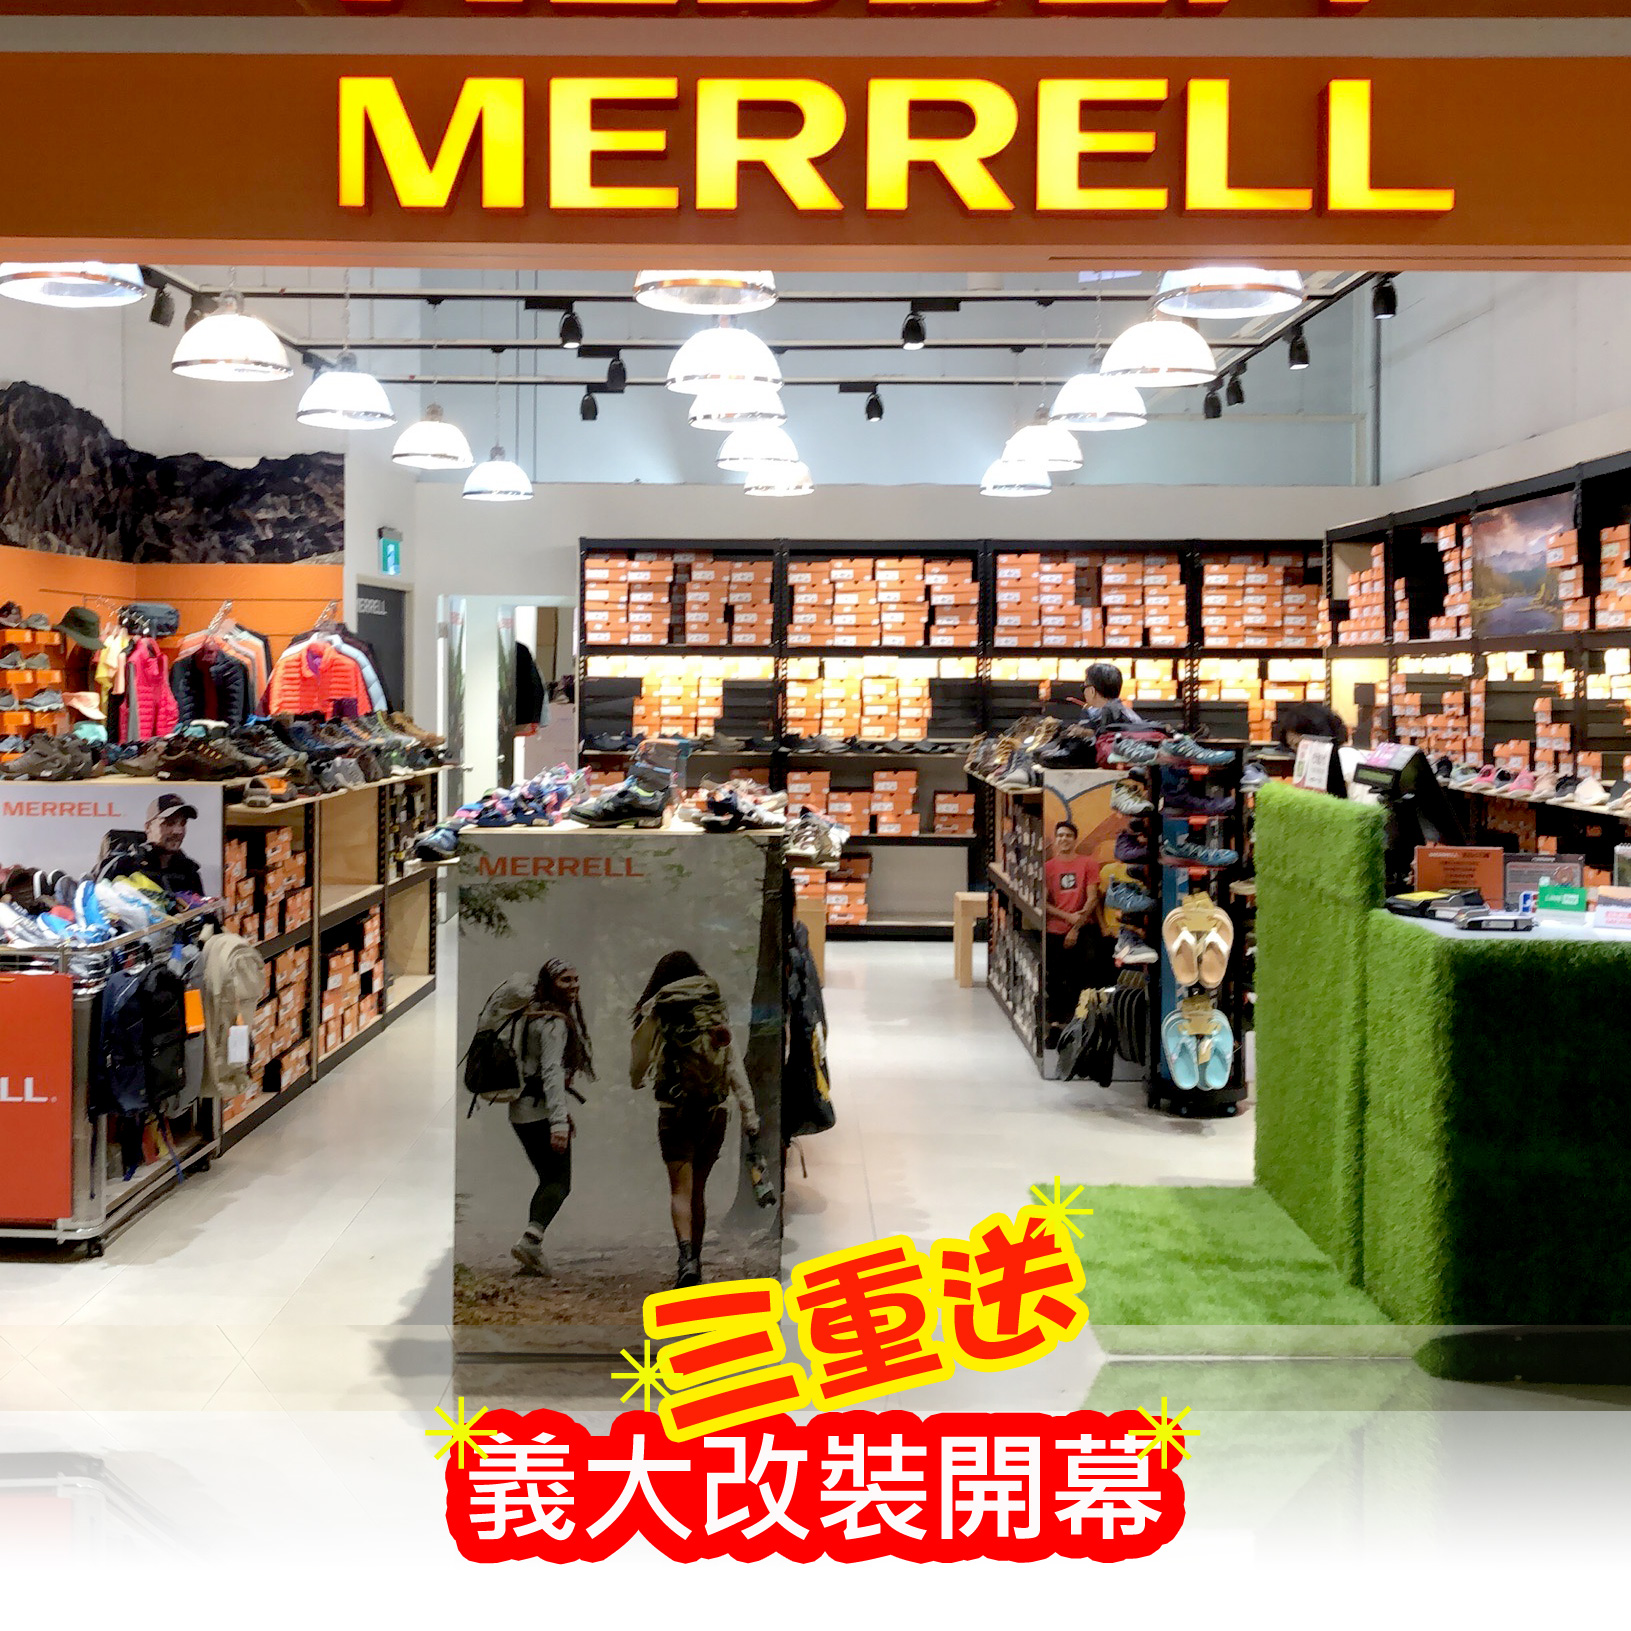 Merrell 義大改裝重新開幕.三重送! <BR>限時限量.敬請把握~!